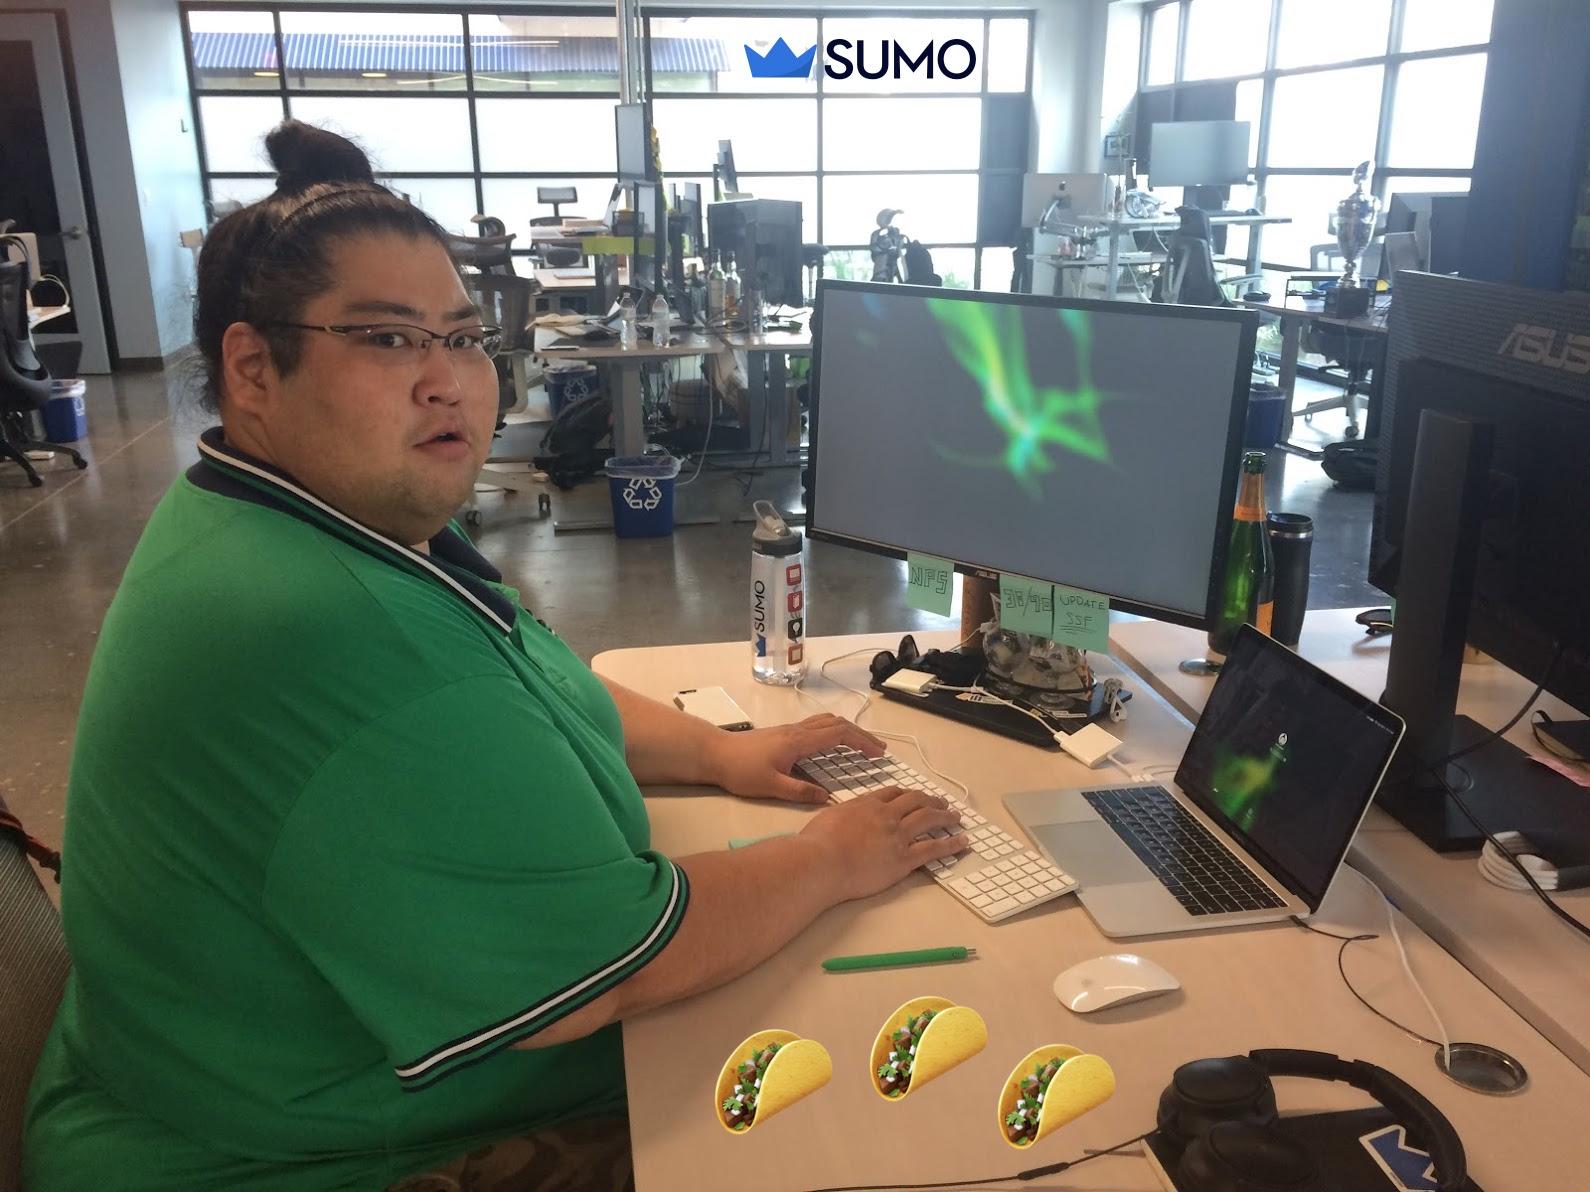 Picture of the sumo headquarters